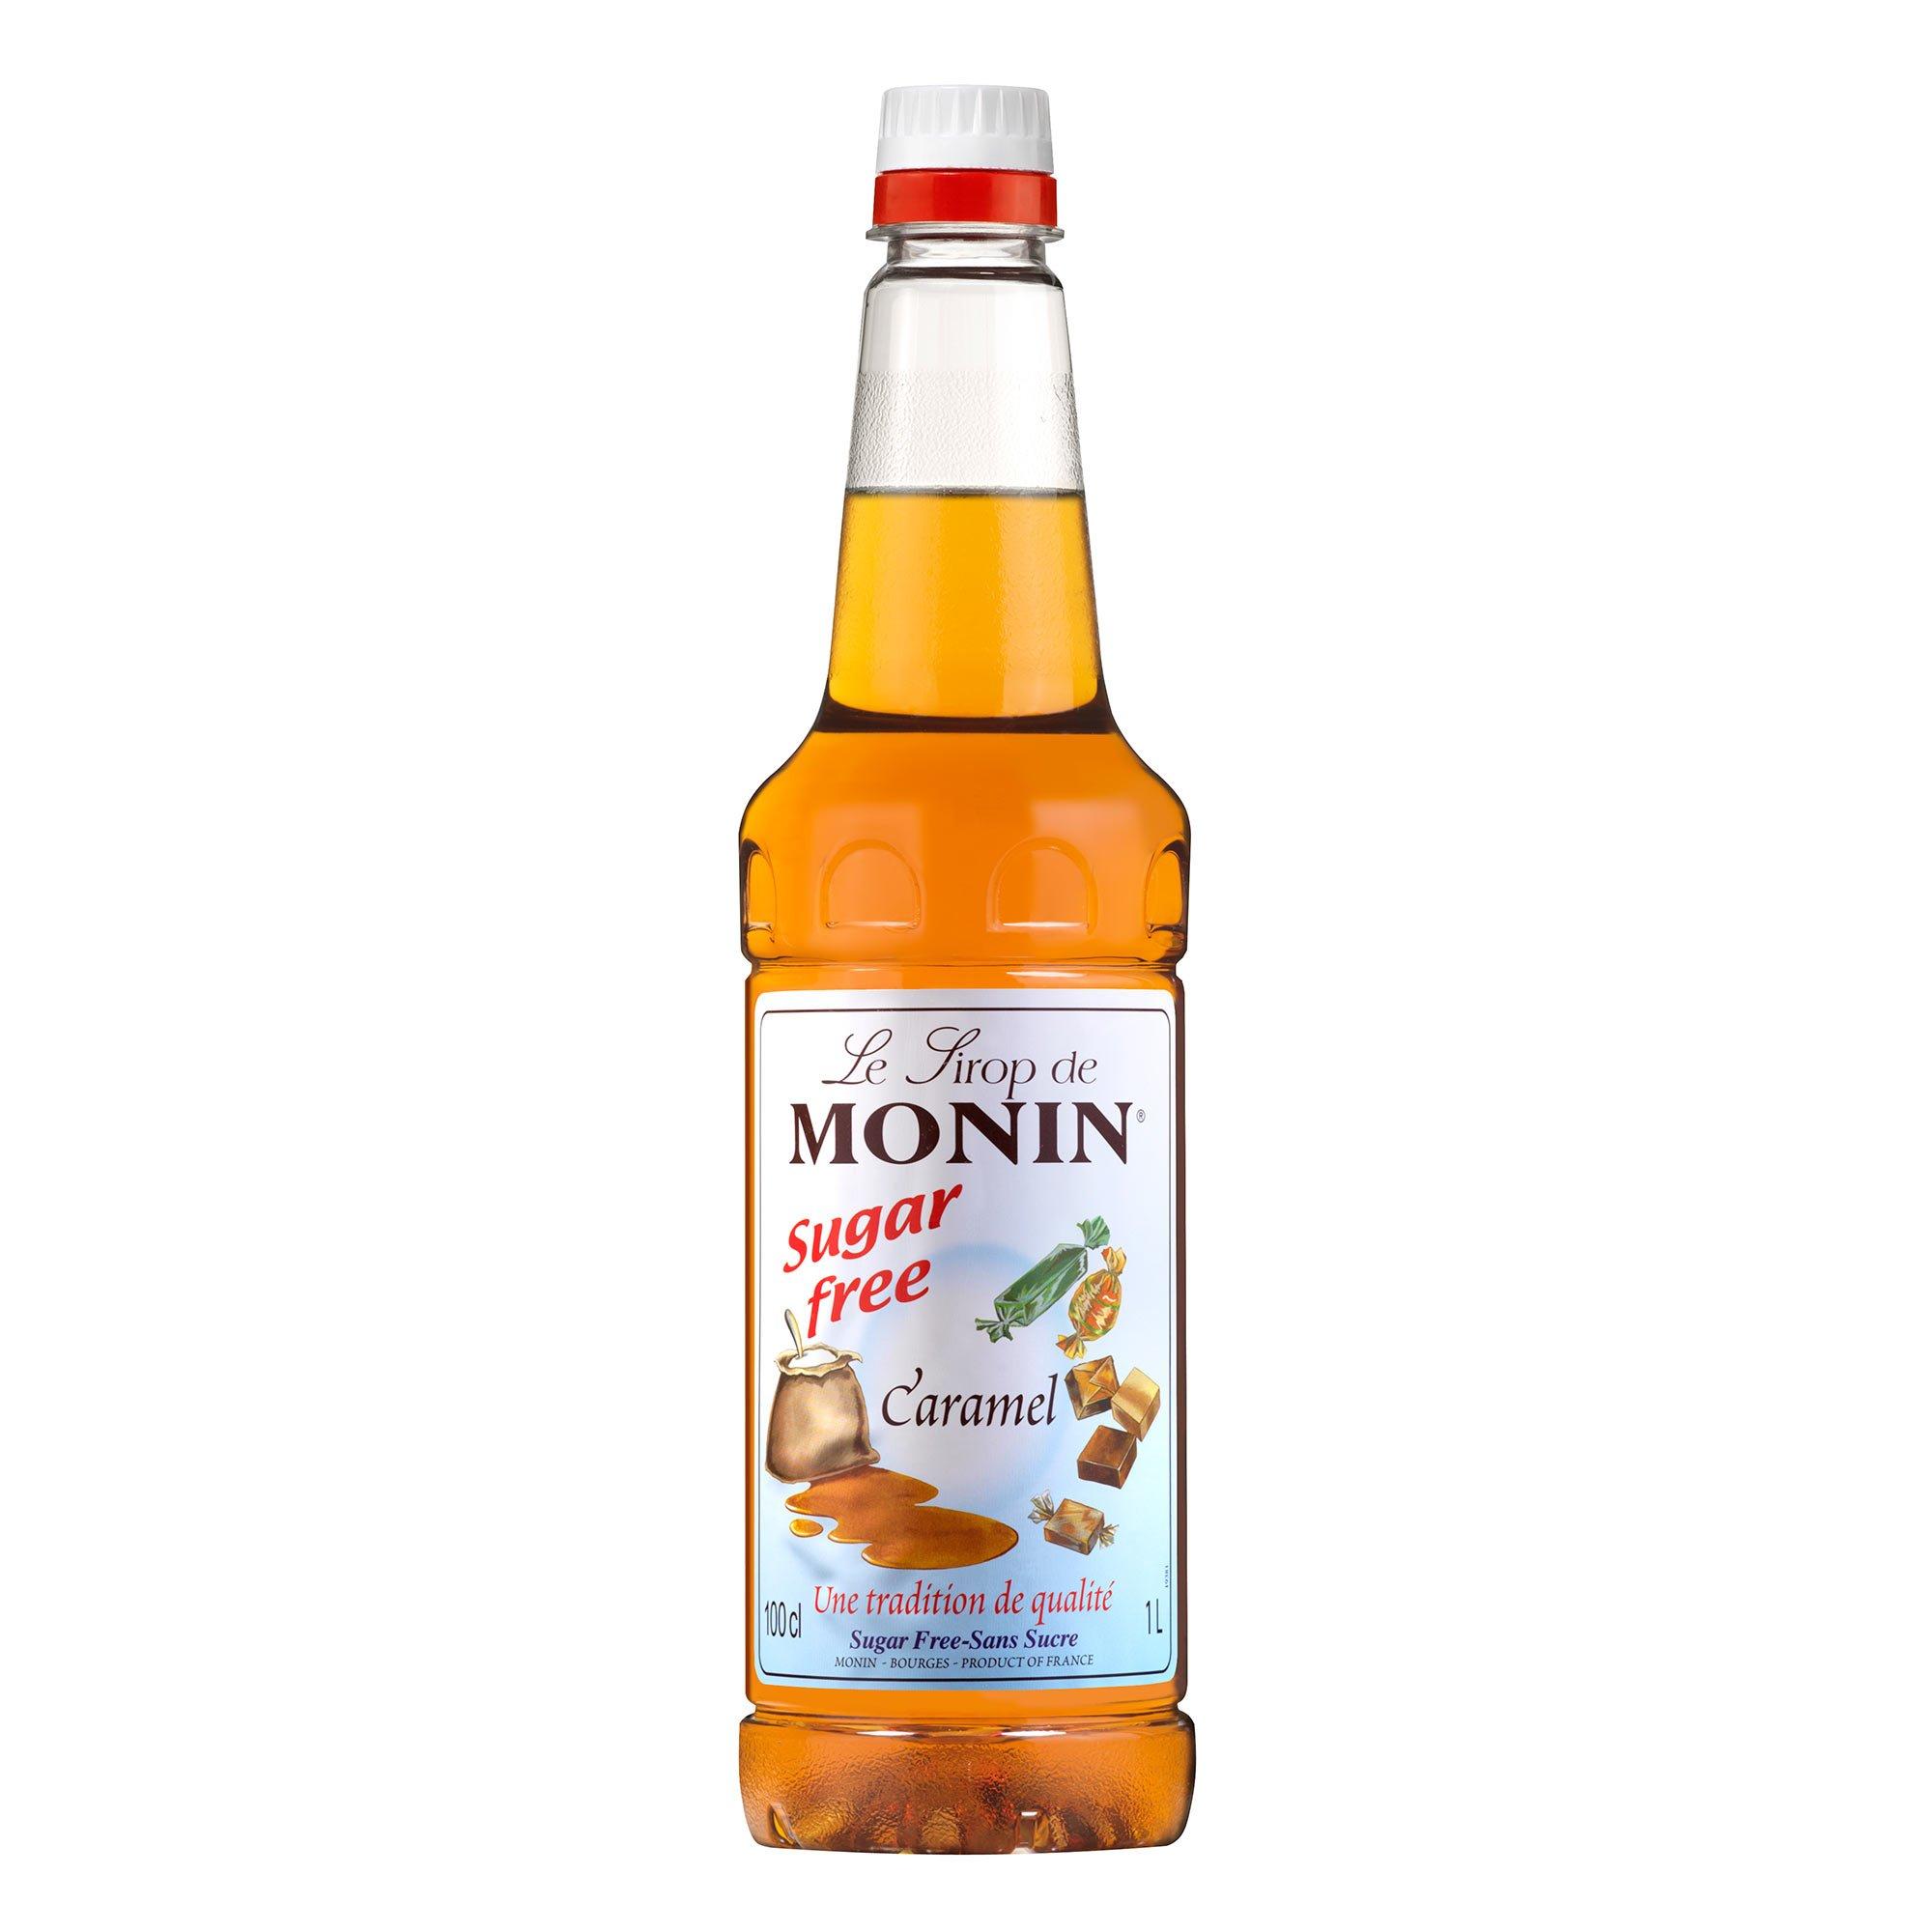 View Monin Sugar Free Caramel Syrup Uk Pics